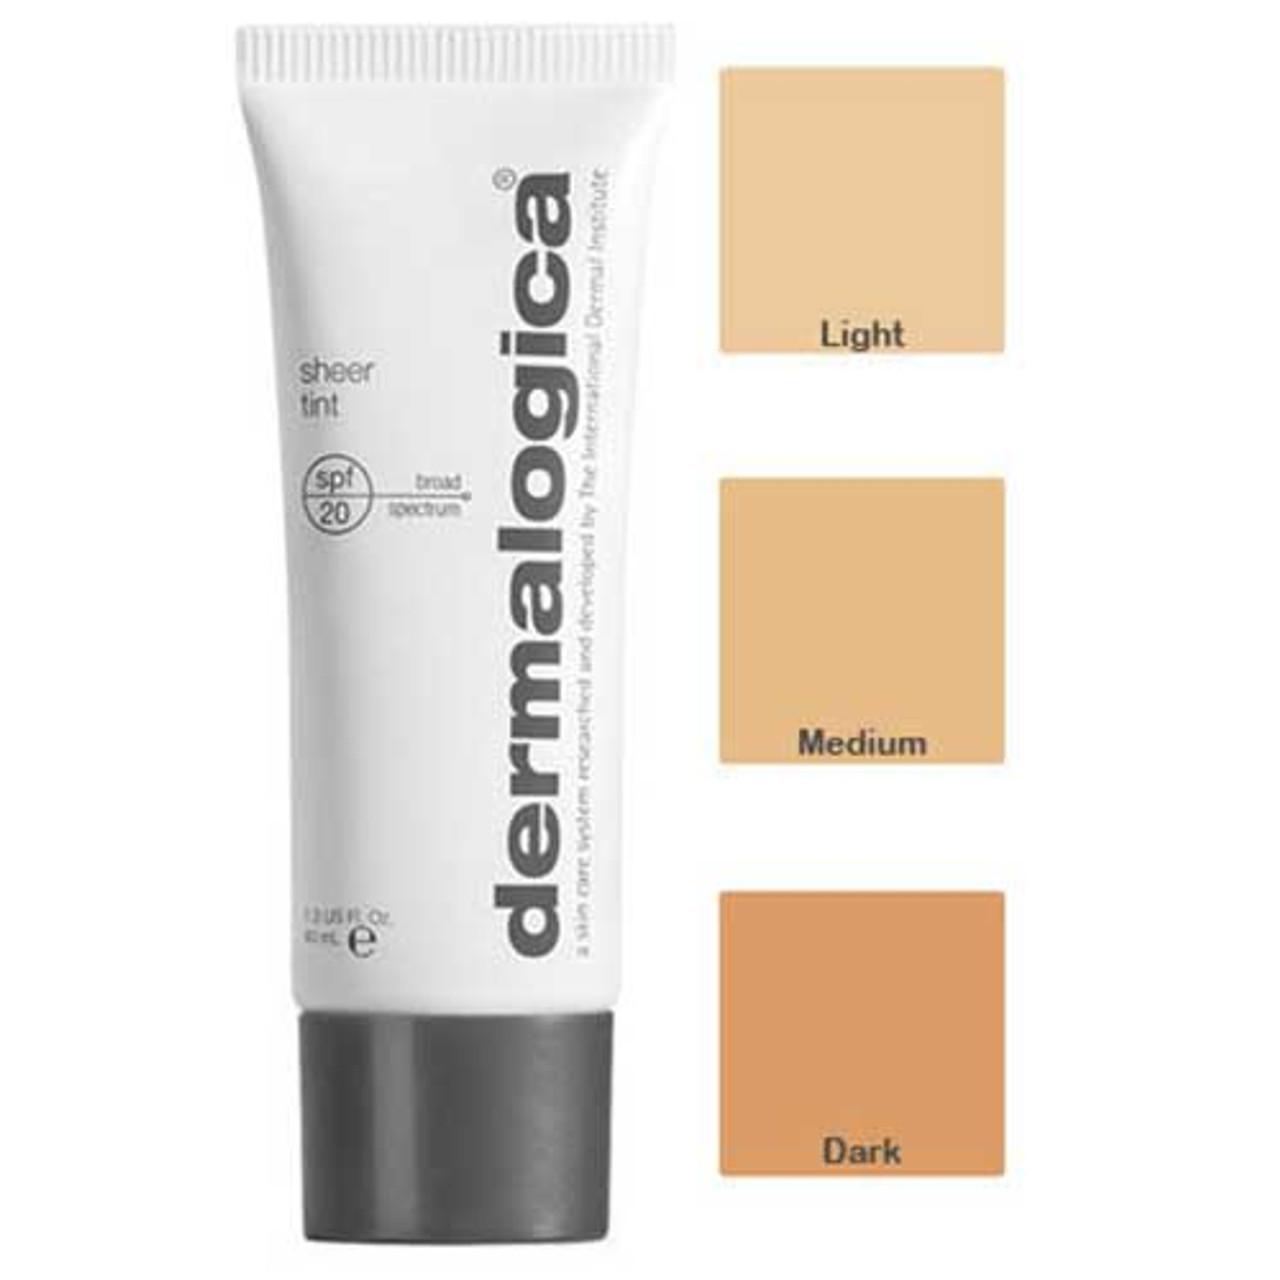 dermalogica tinted moisturiser